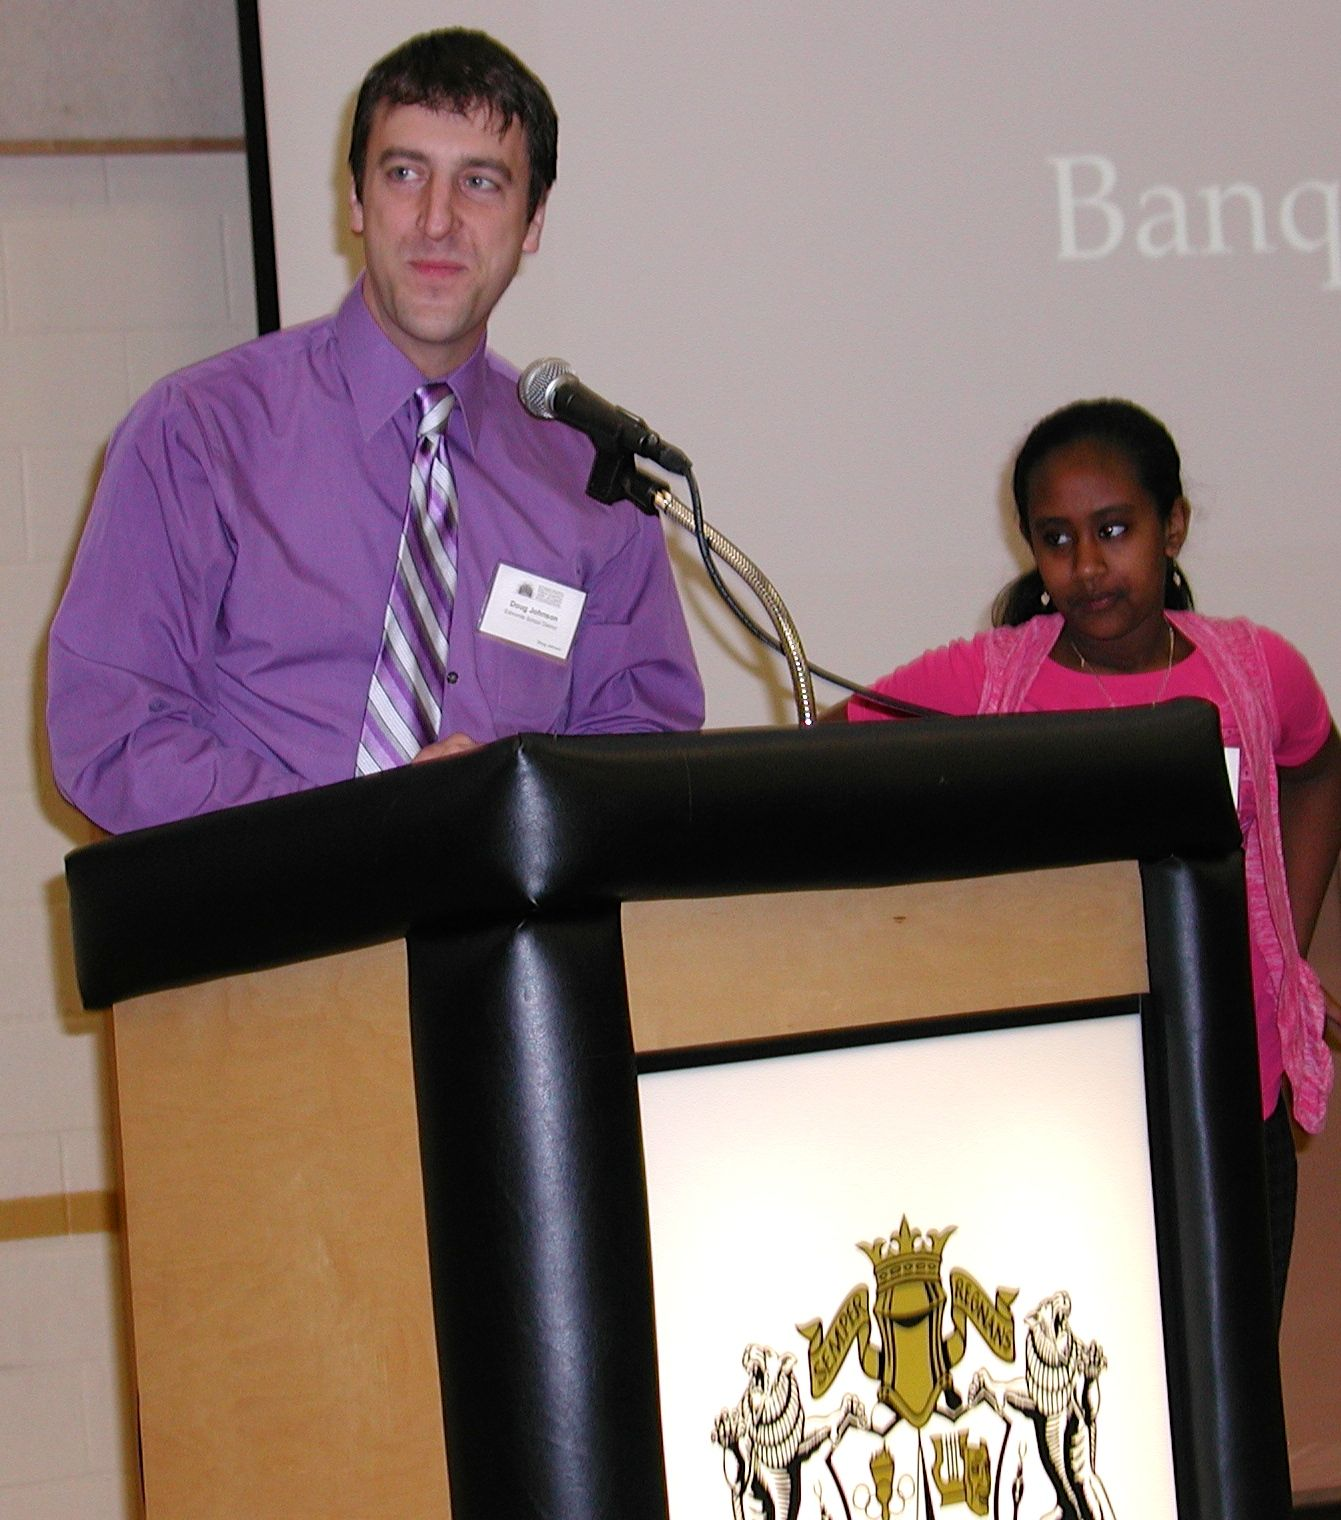 Melat Gebremeskel is introduced by Mountlake Terrace Elementary Principal Doug Johnson.